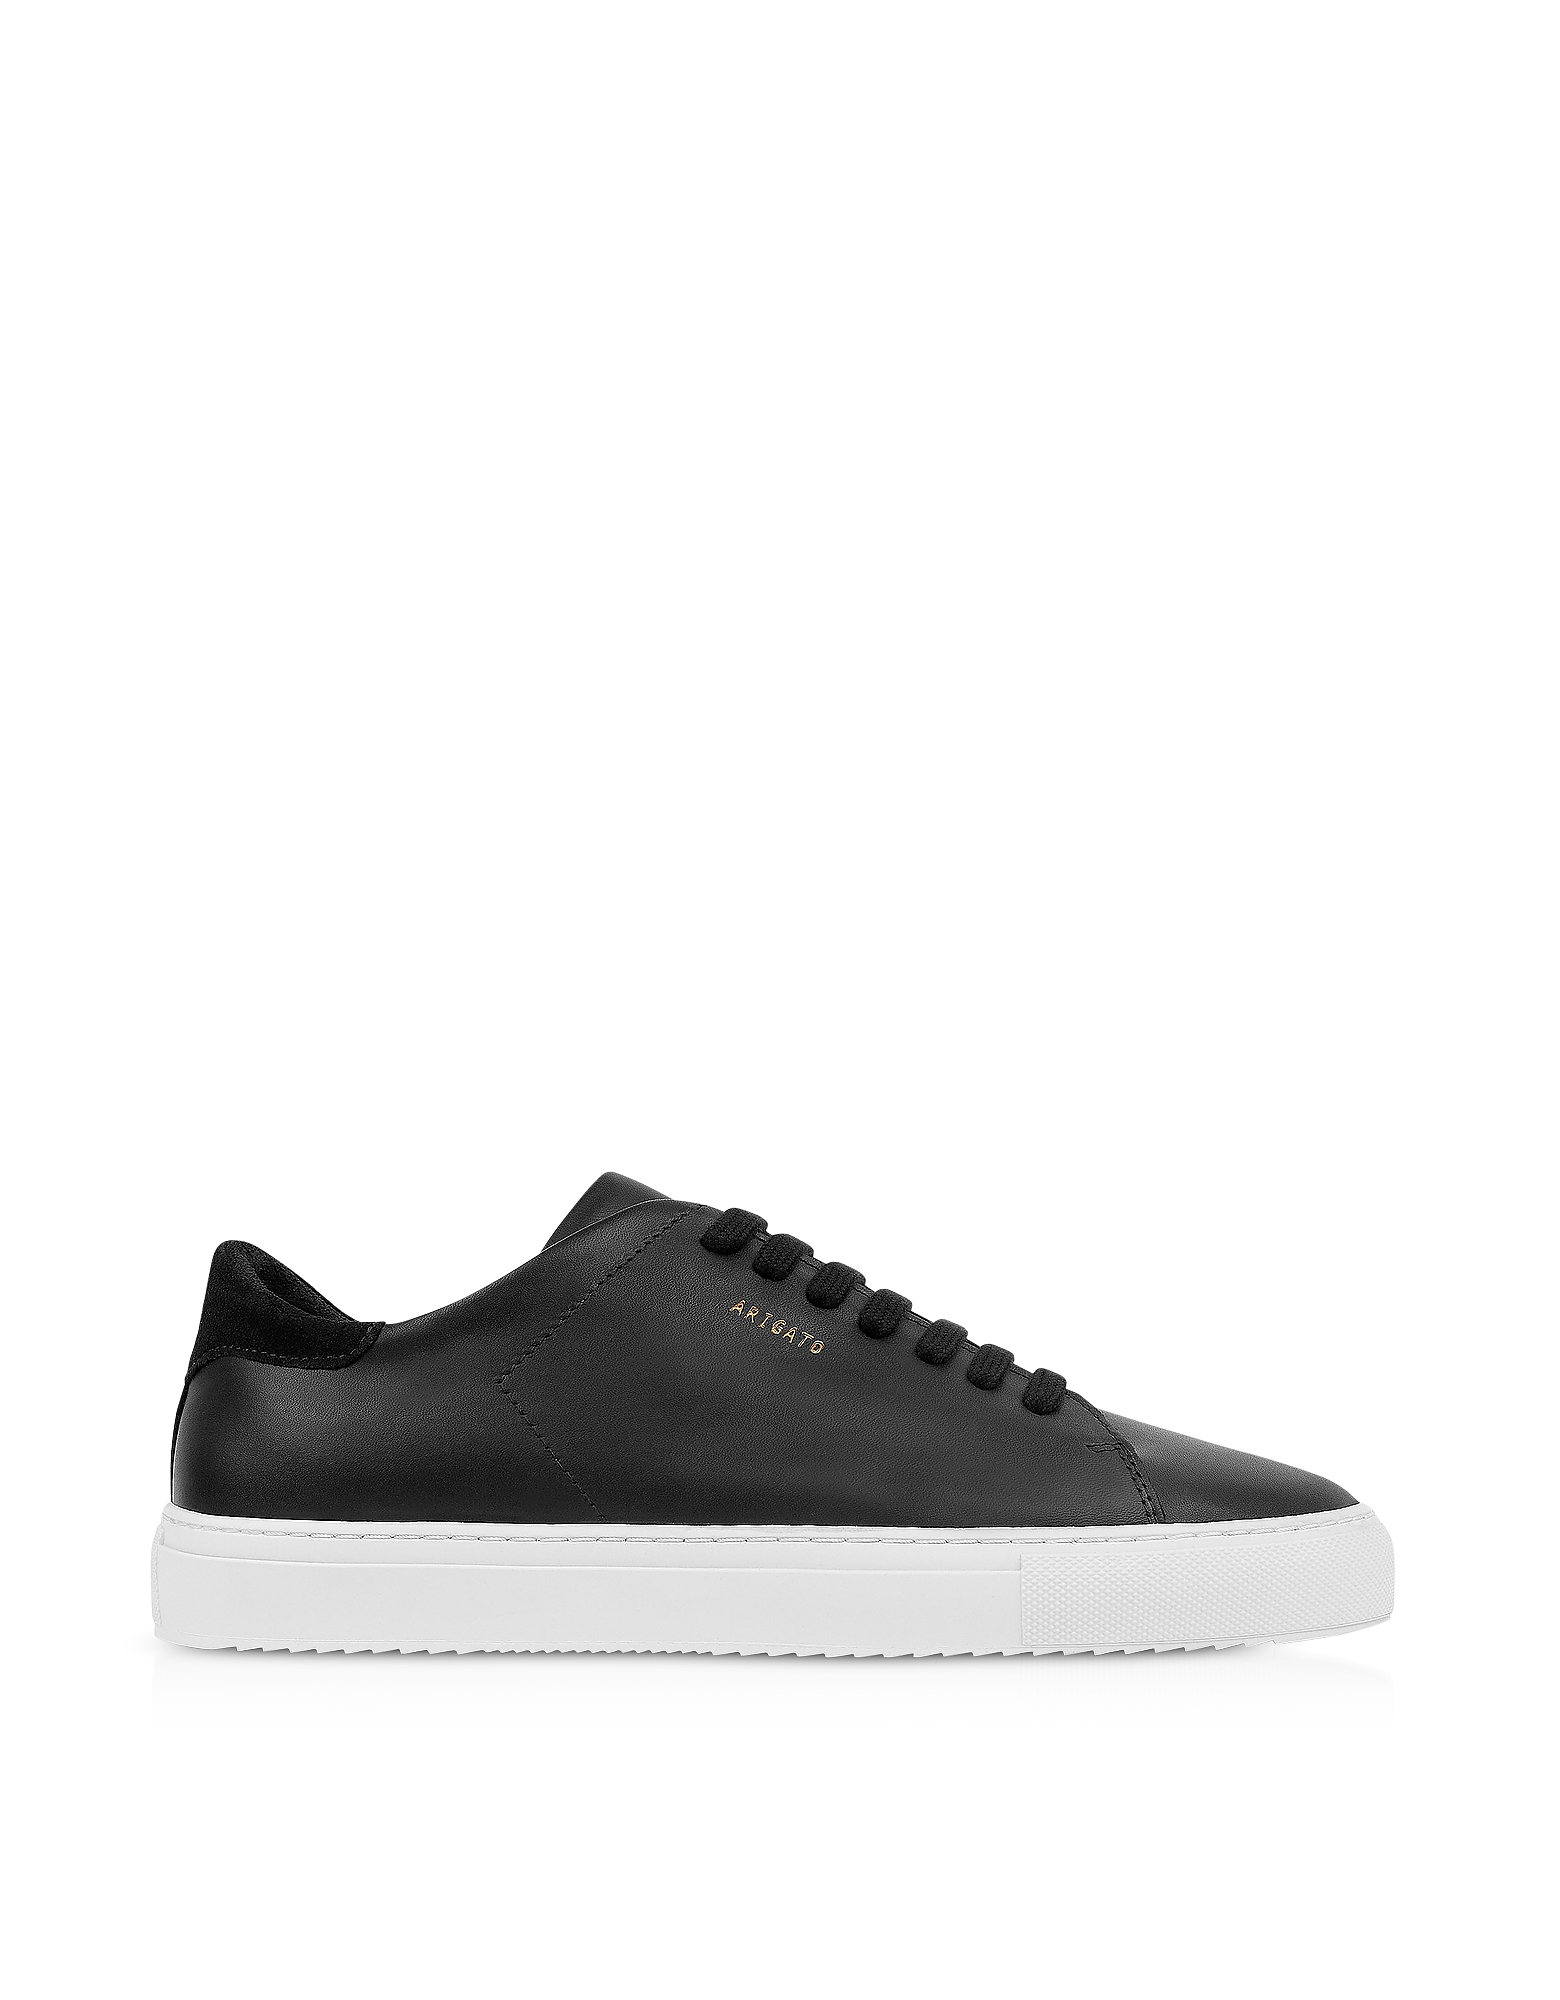 Clean 90 Black Leather Women's Sneakers